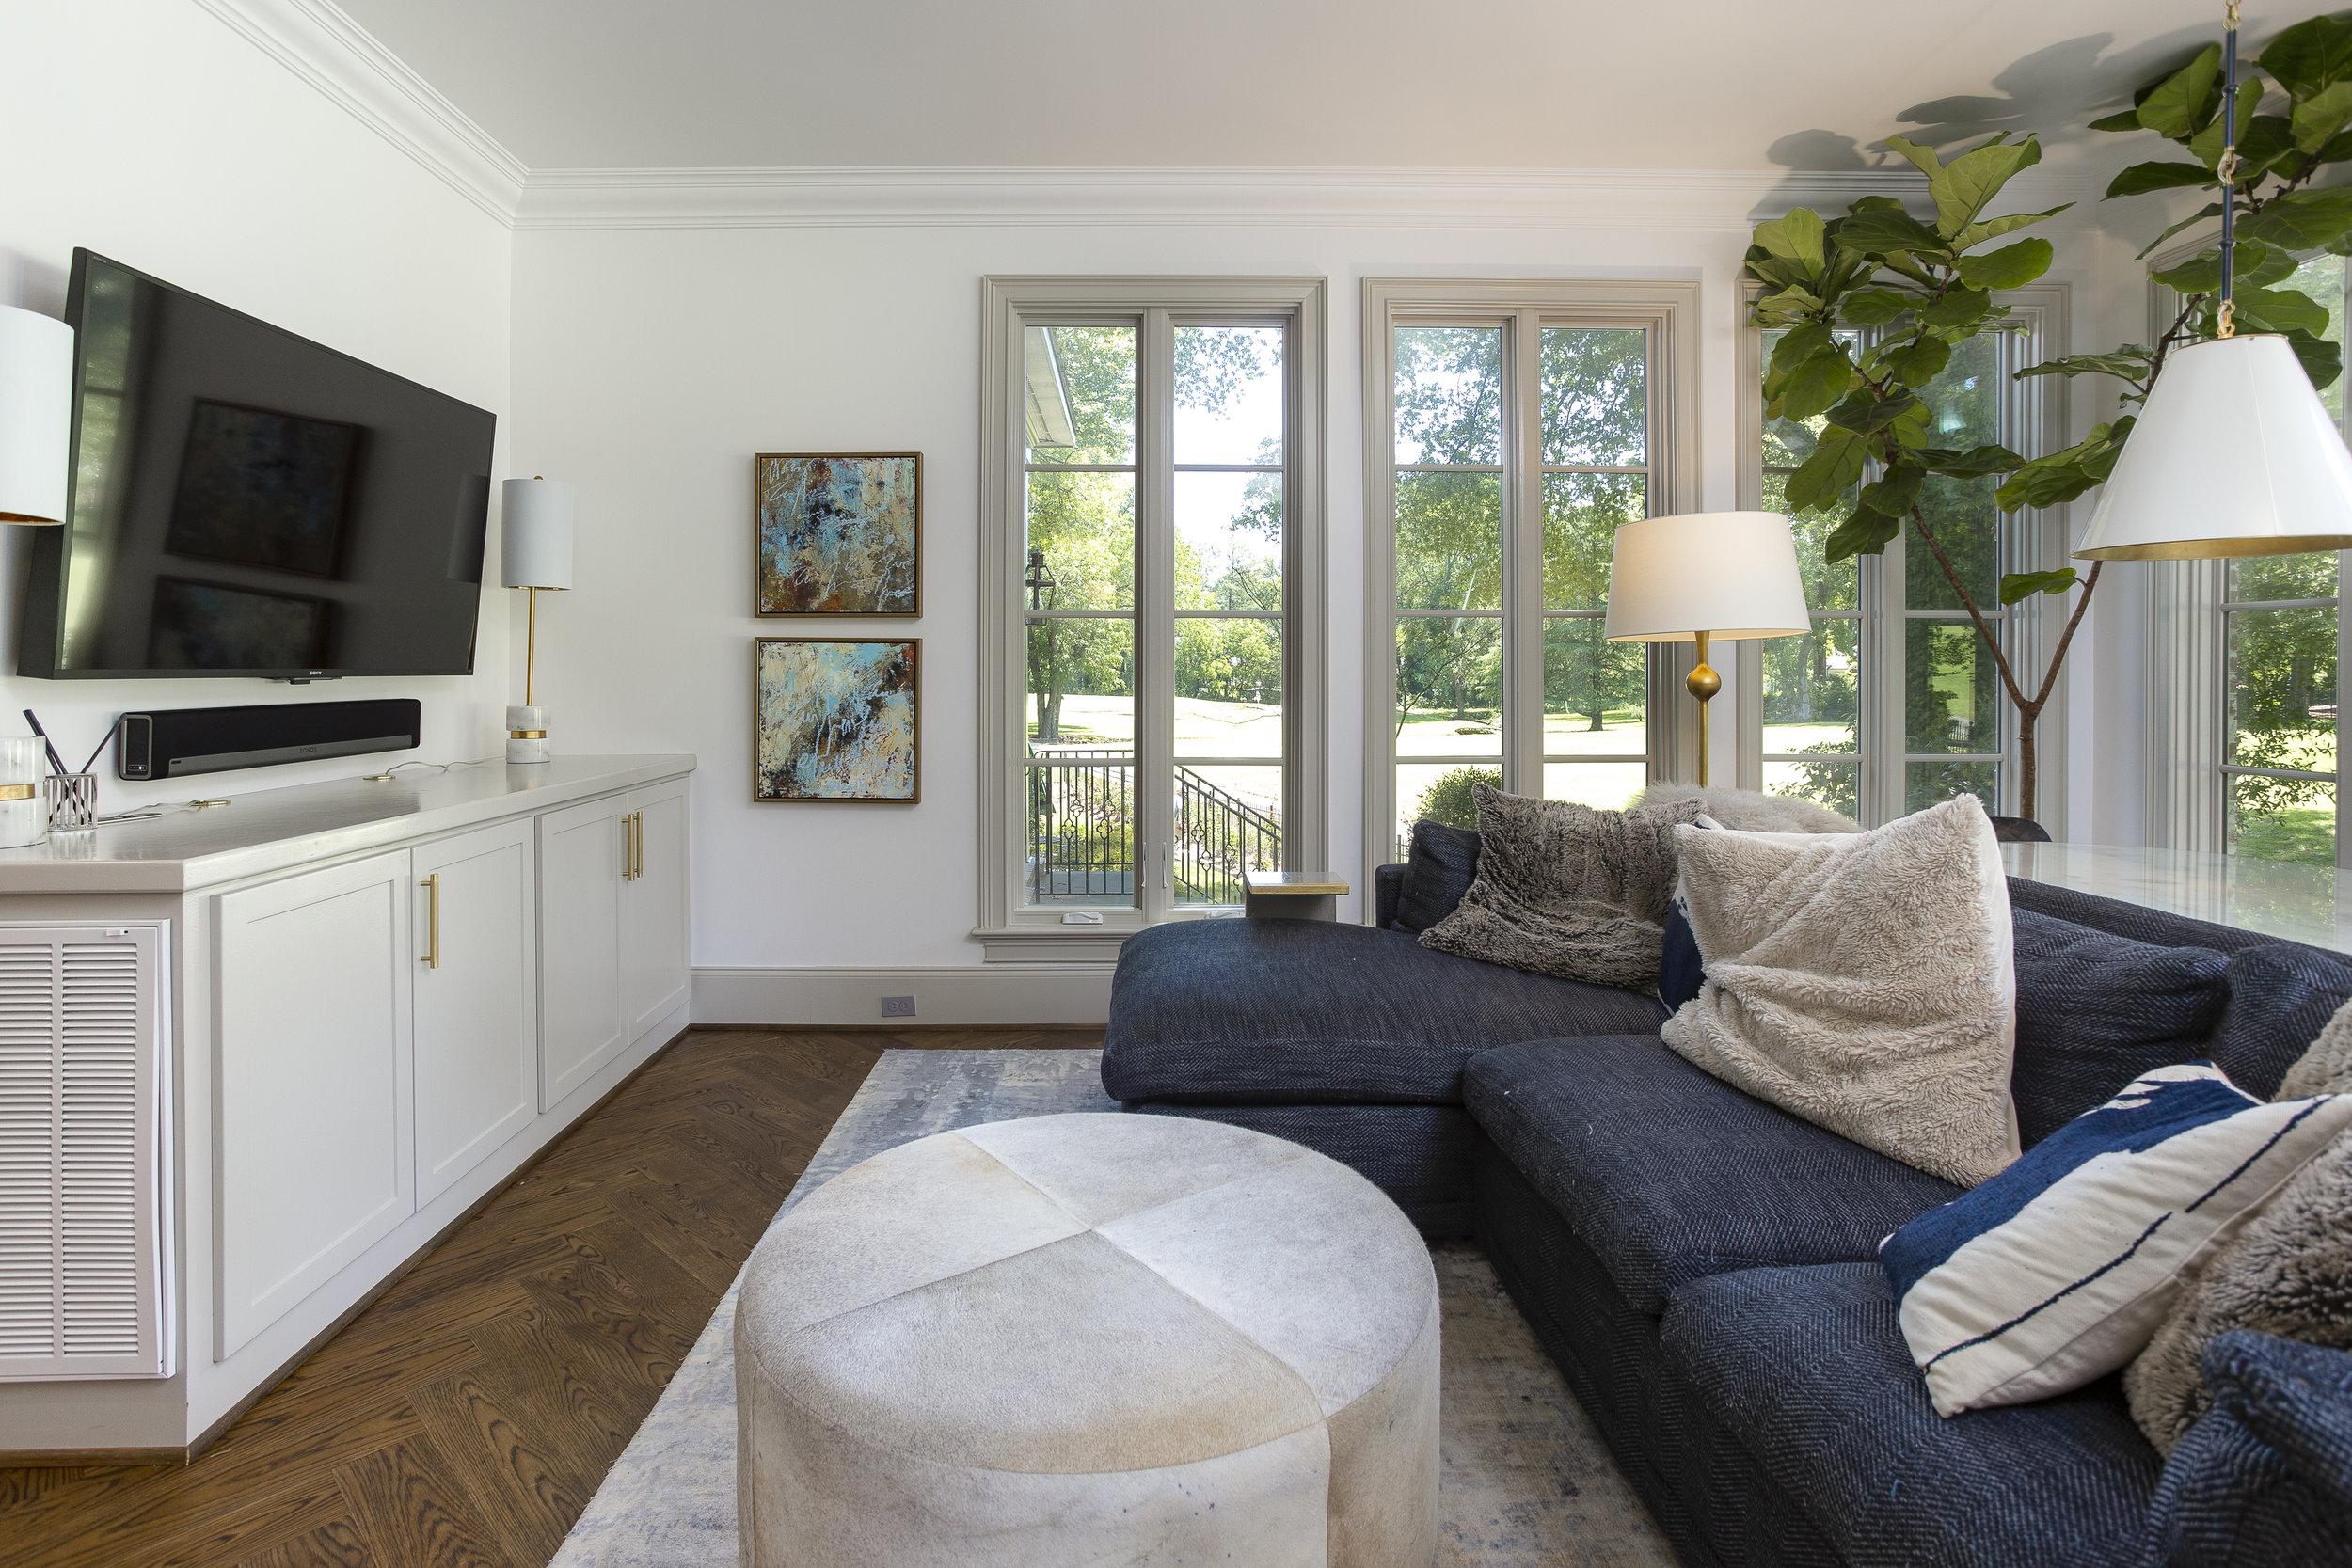 greesboro-real-estate-photographer-photography-commercial-realtor-house-high-point-kernersville-burlington115.jpg